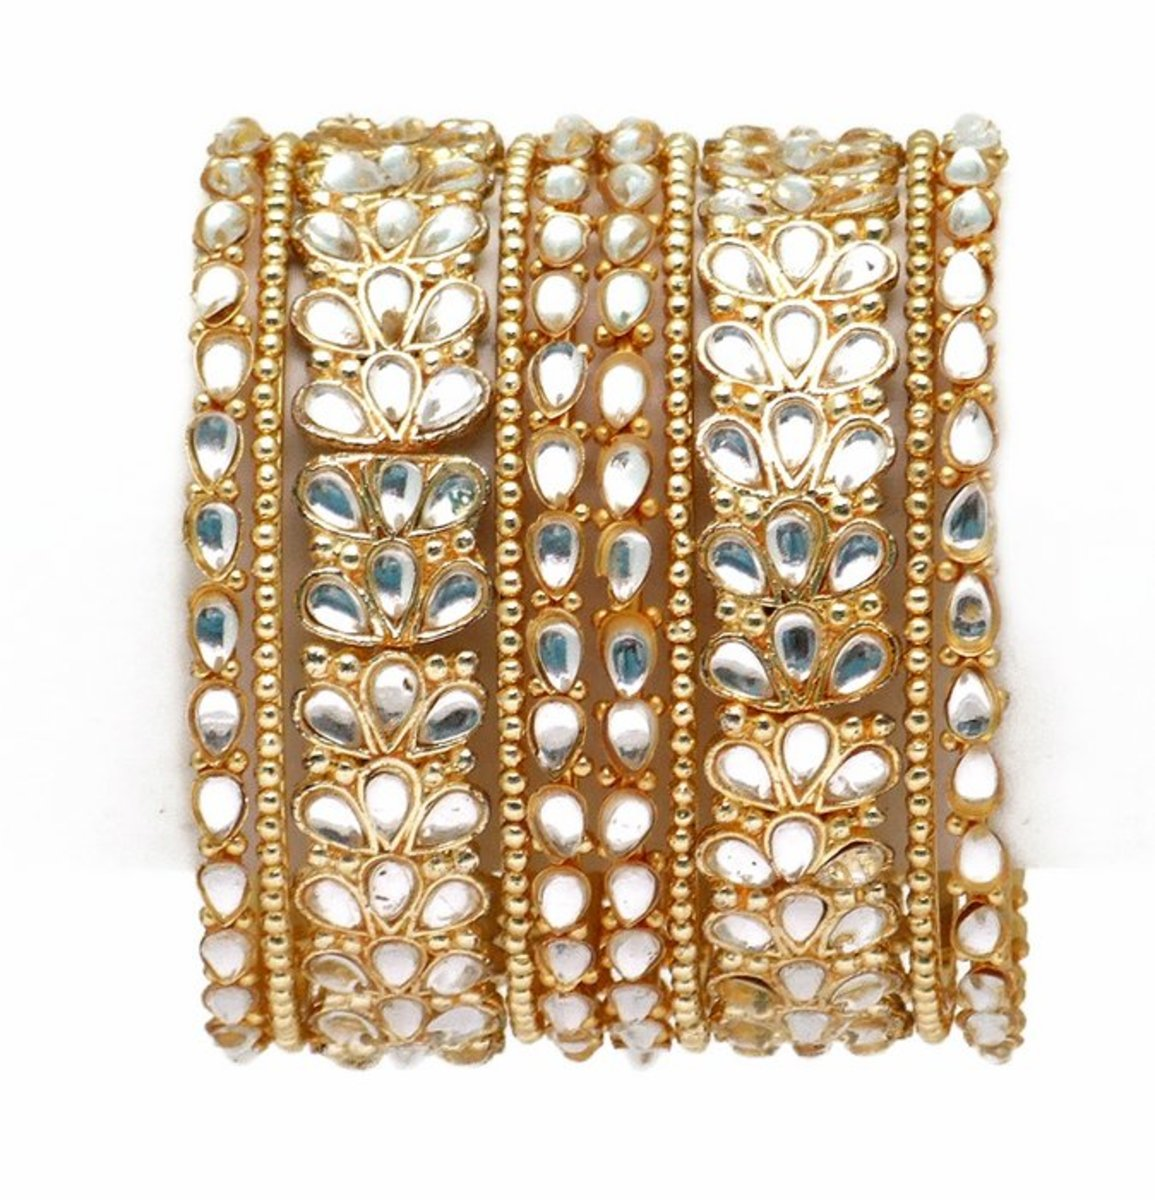 Gold and kundan bangle design